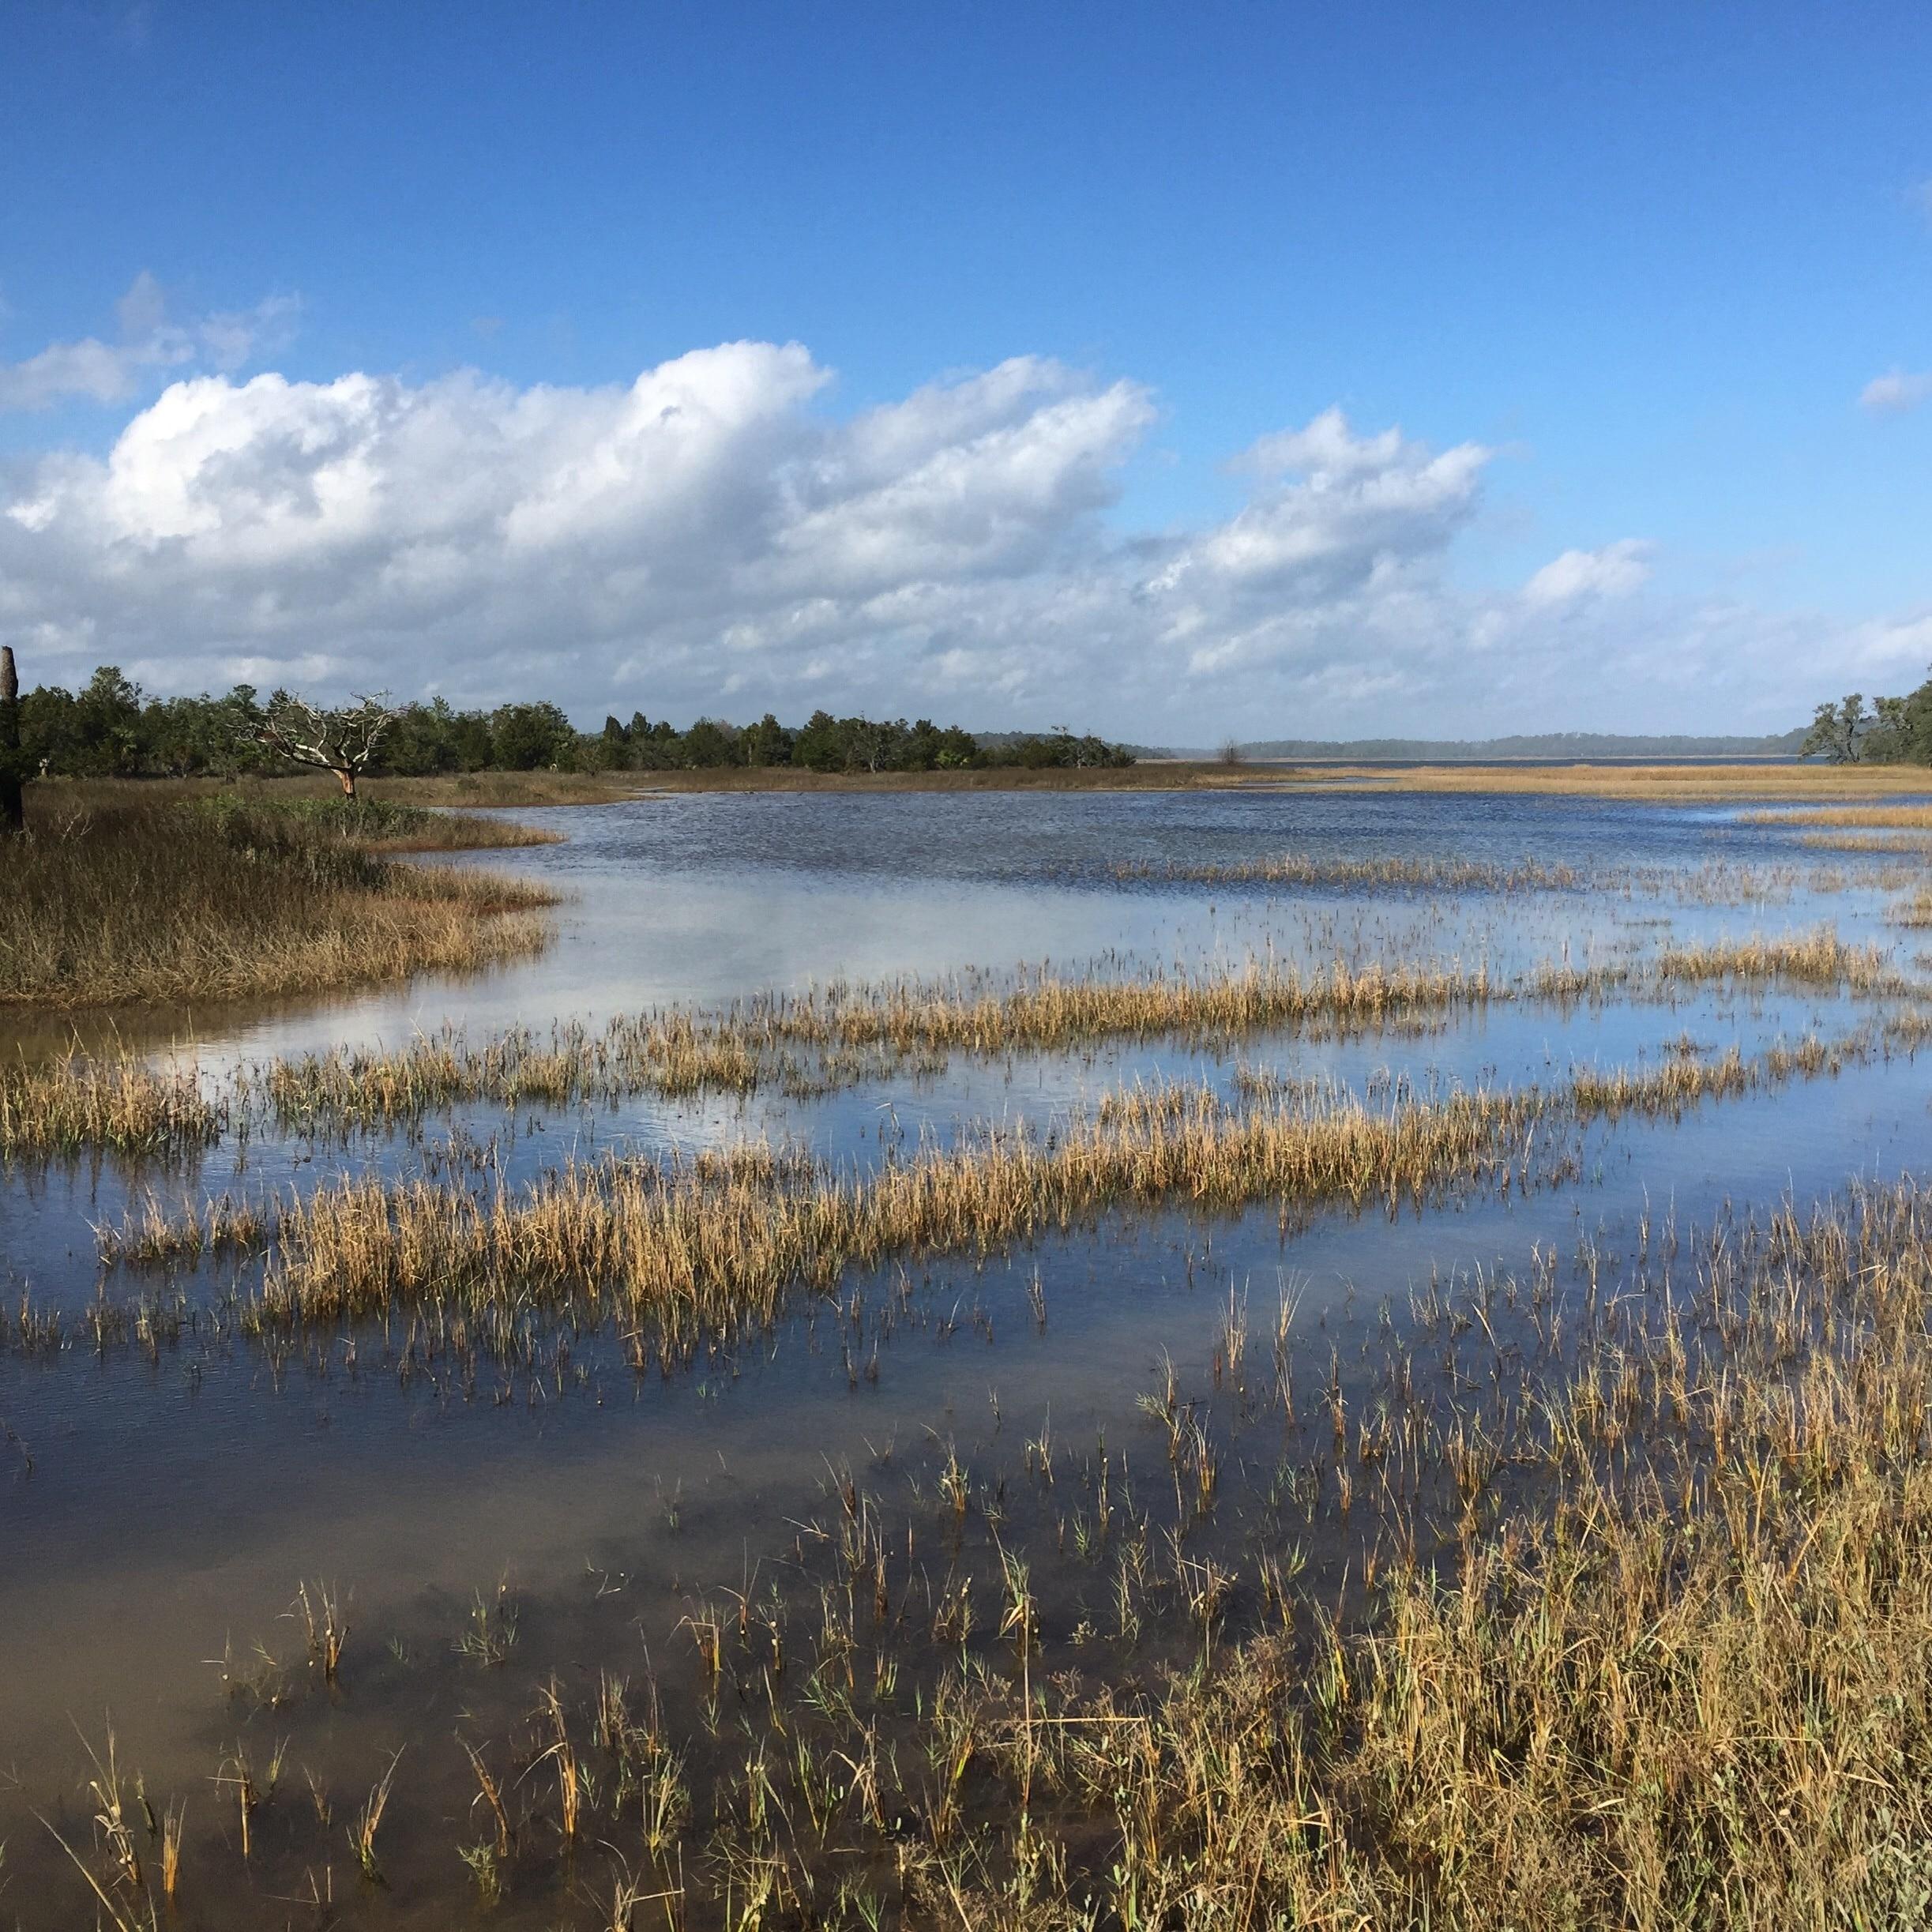 Nationaal natuurreservaat Pinckney Island, South Carolina, Verenigde Staten